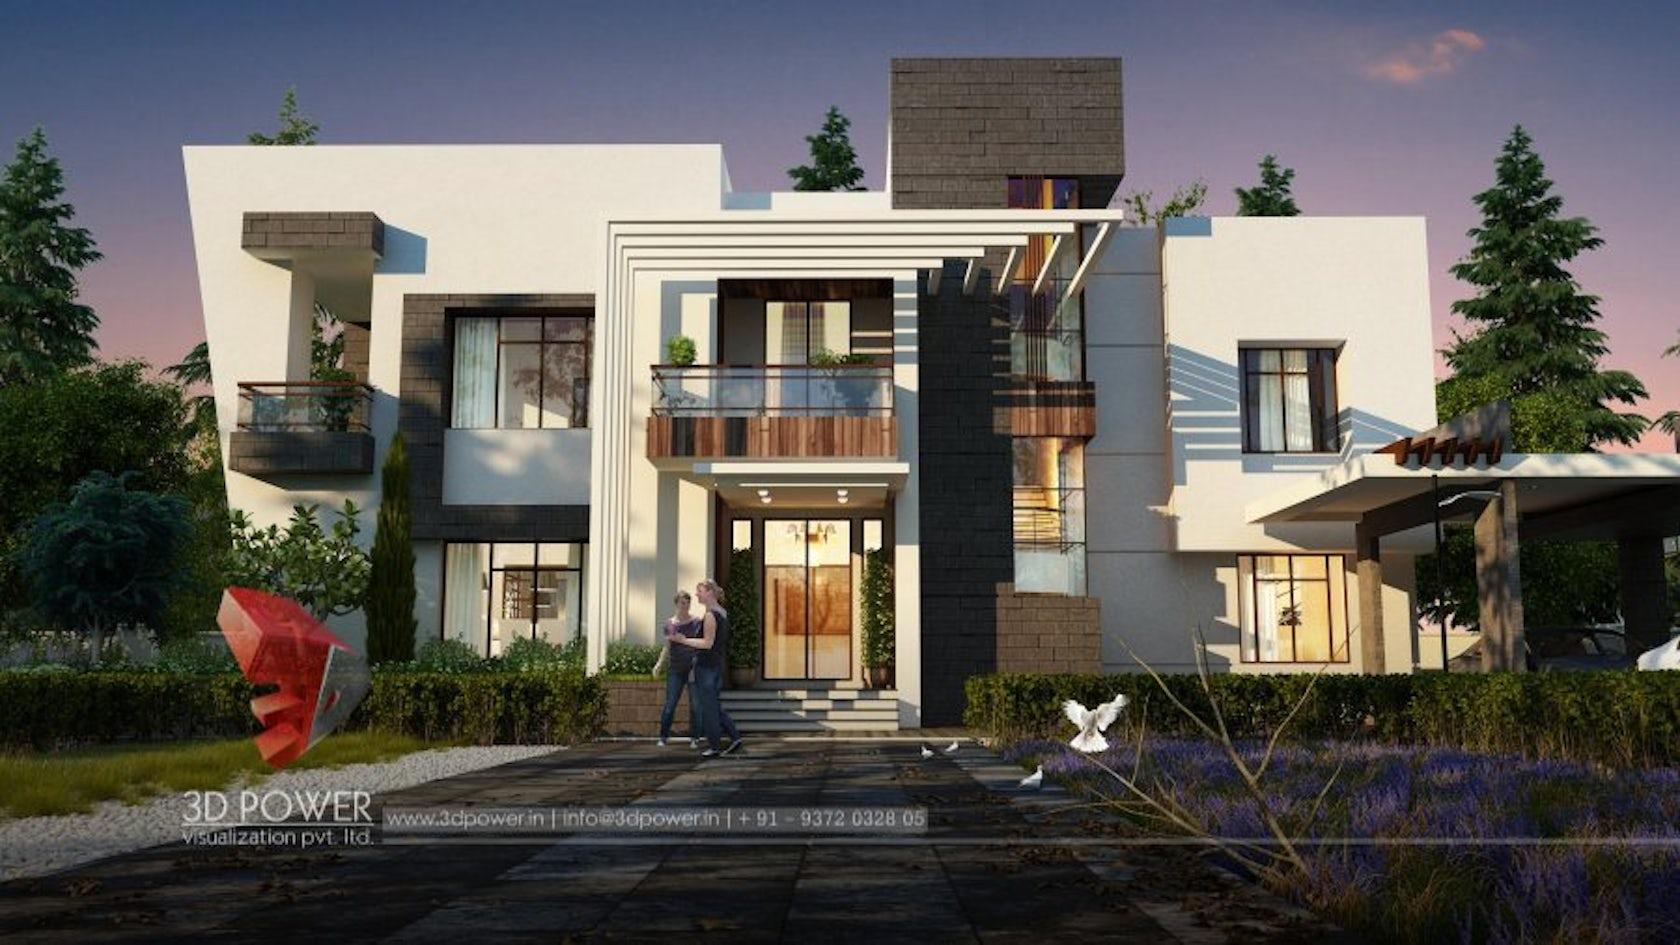 3d power visualization pvt ltd architizer for Terrace elevation designs